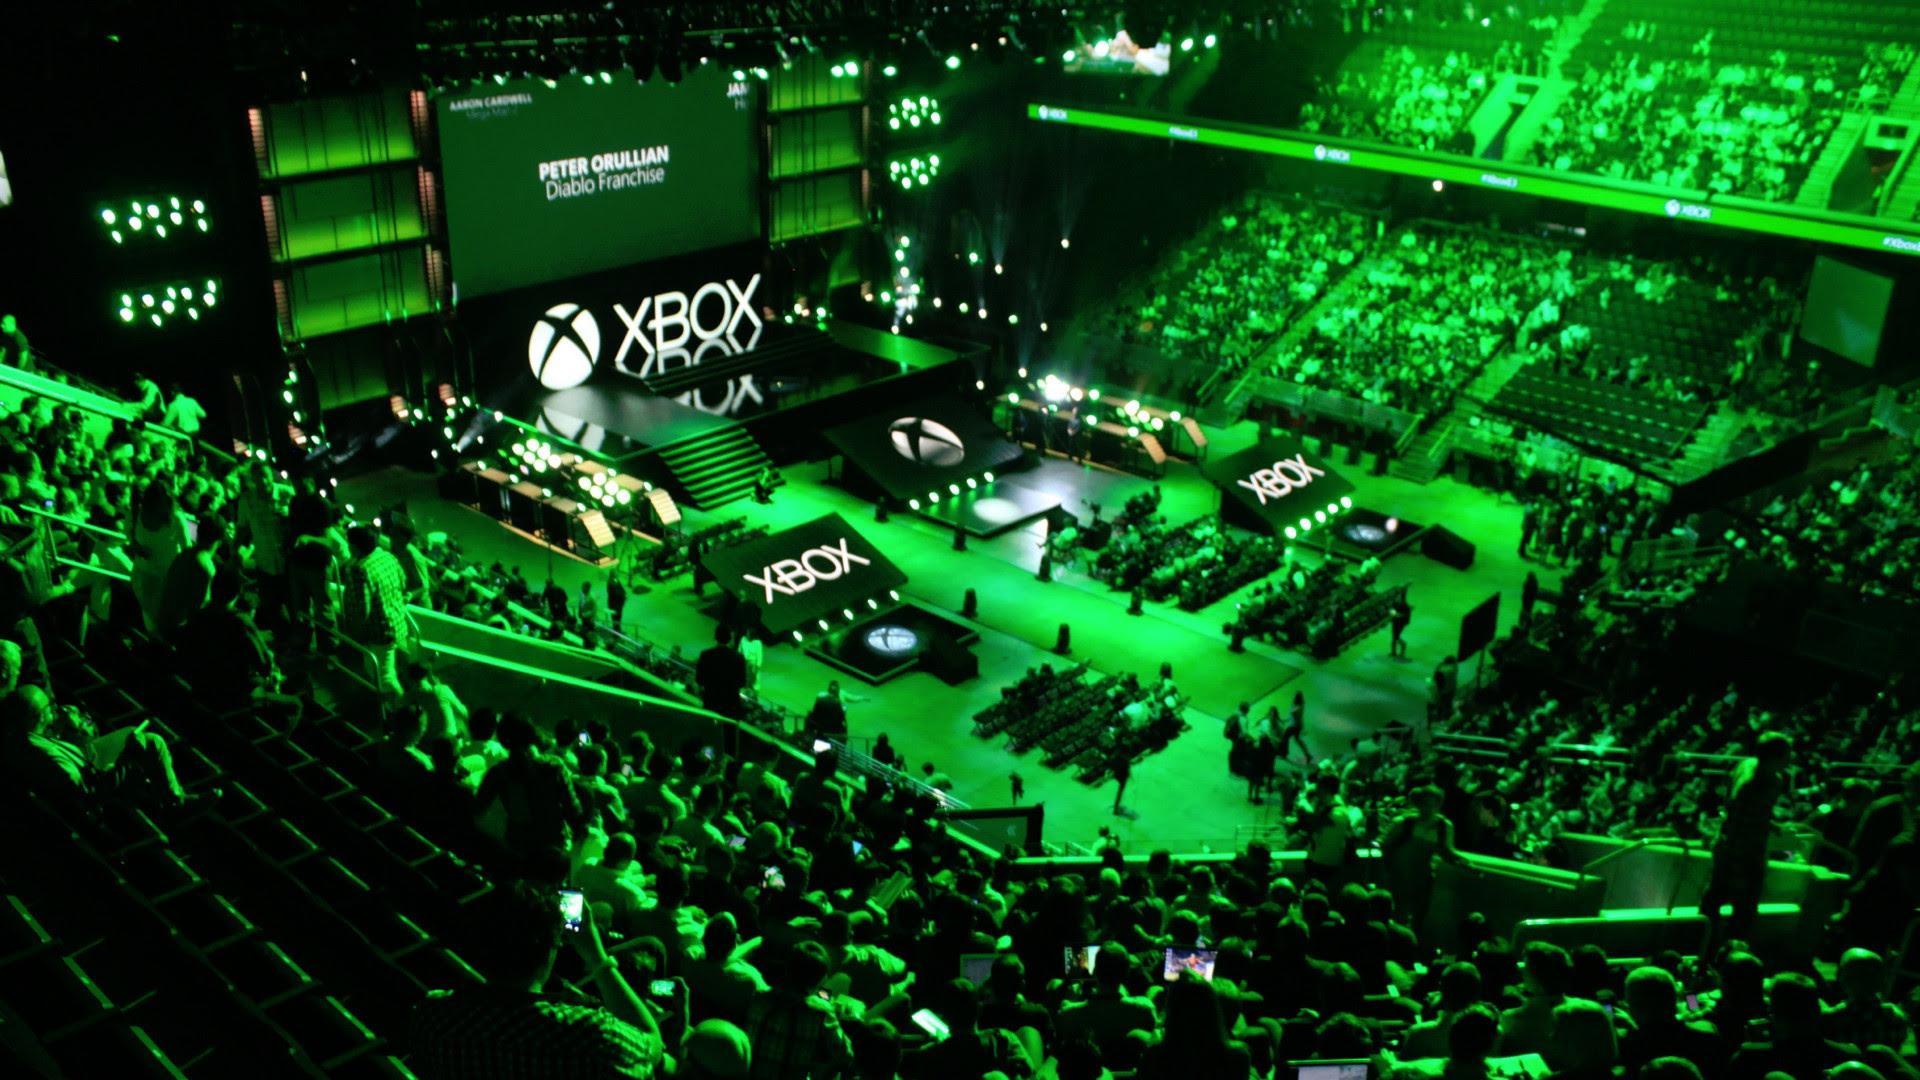 Xbox's press conference will run longer than usual screenshot